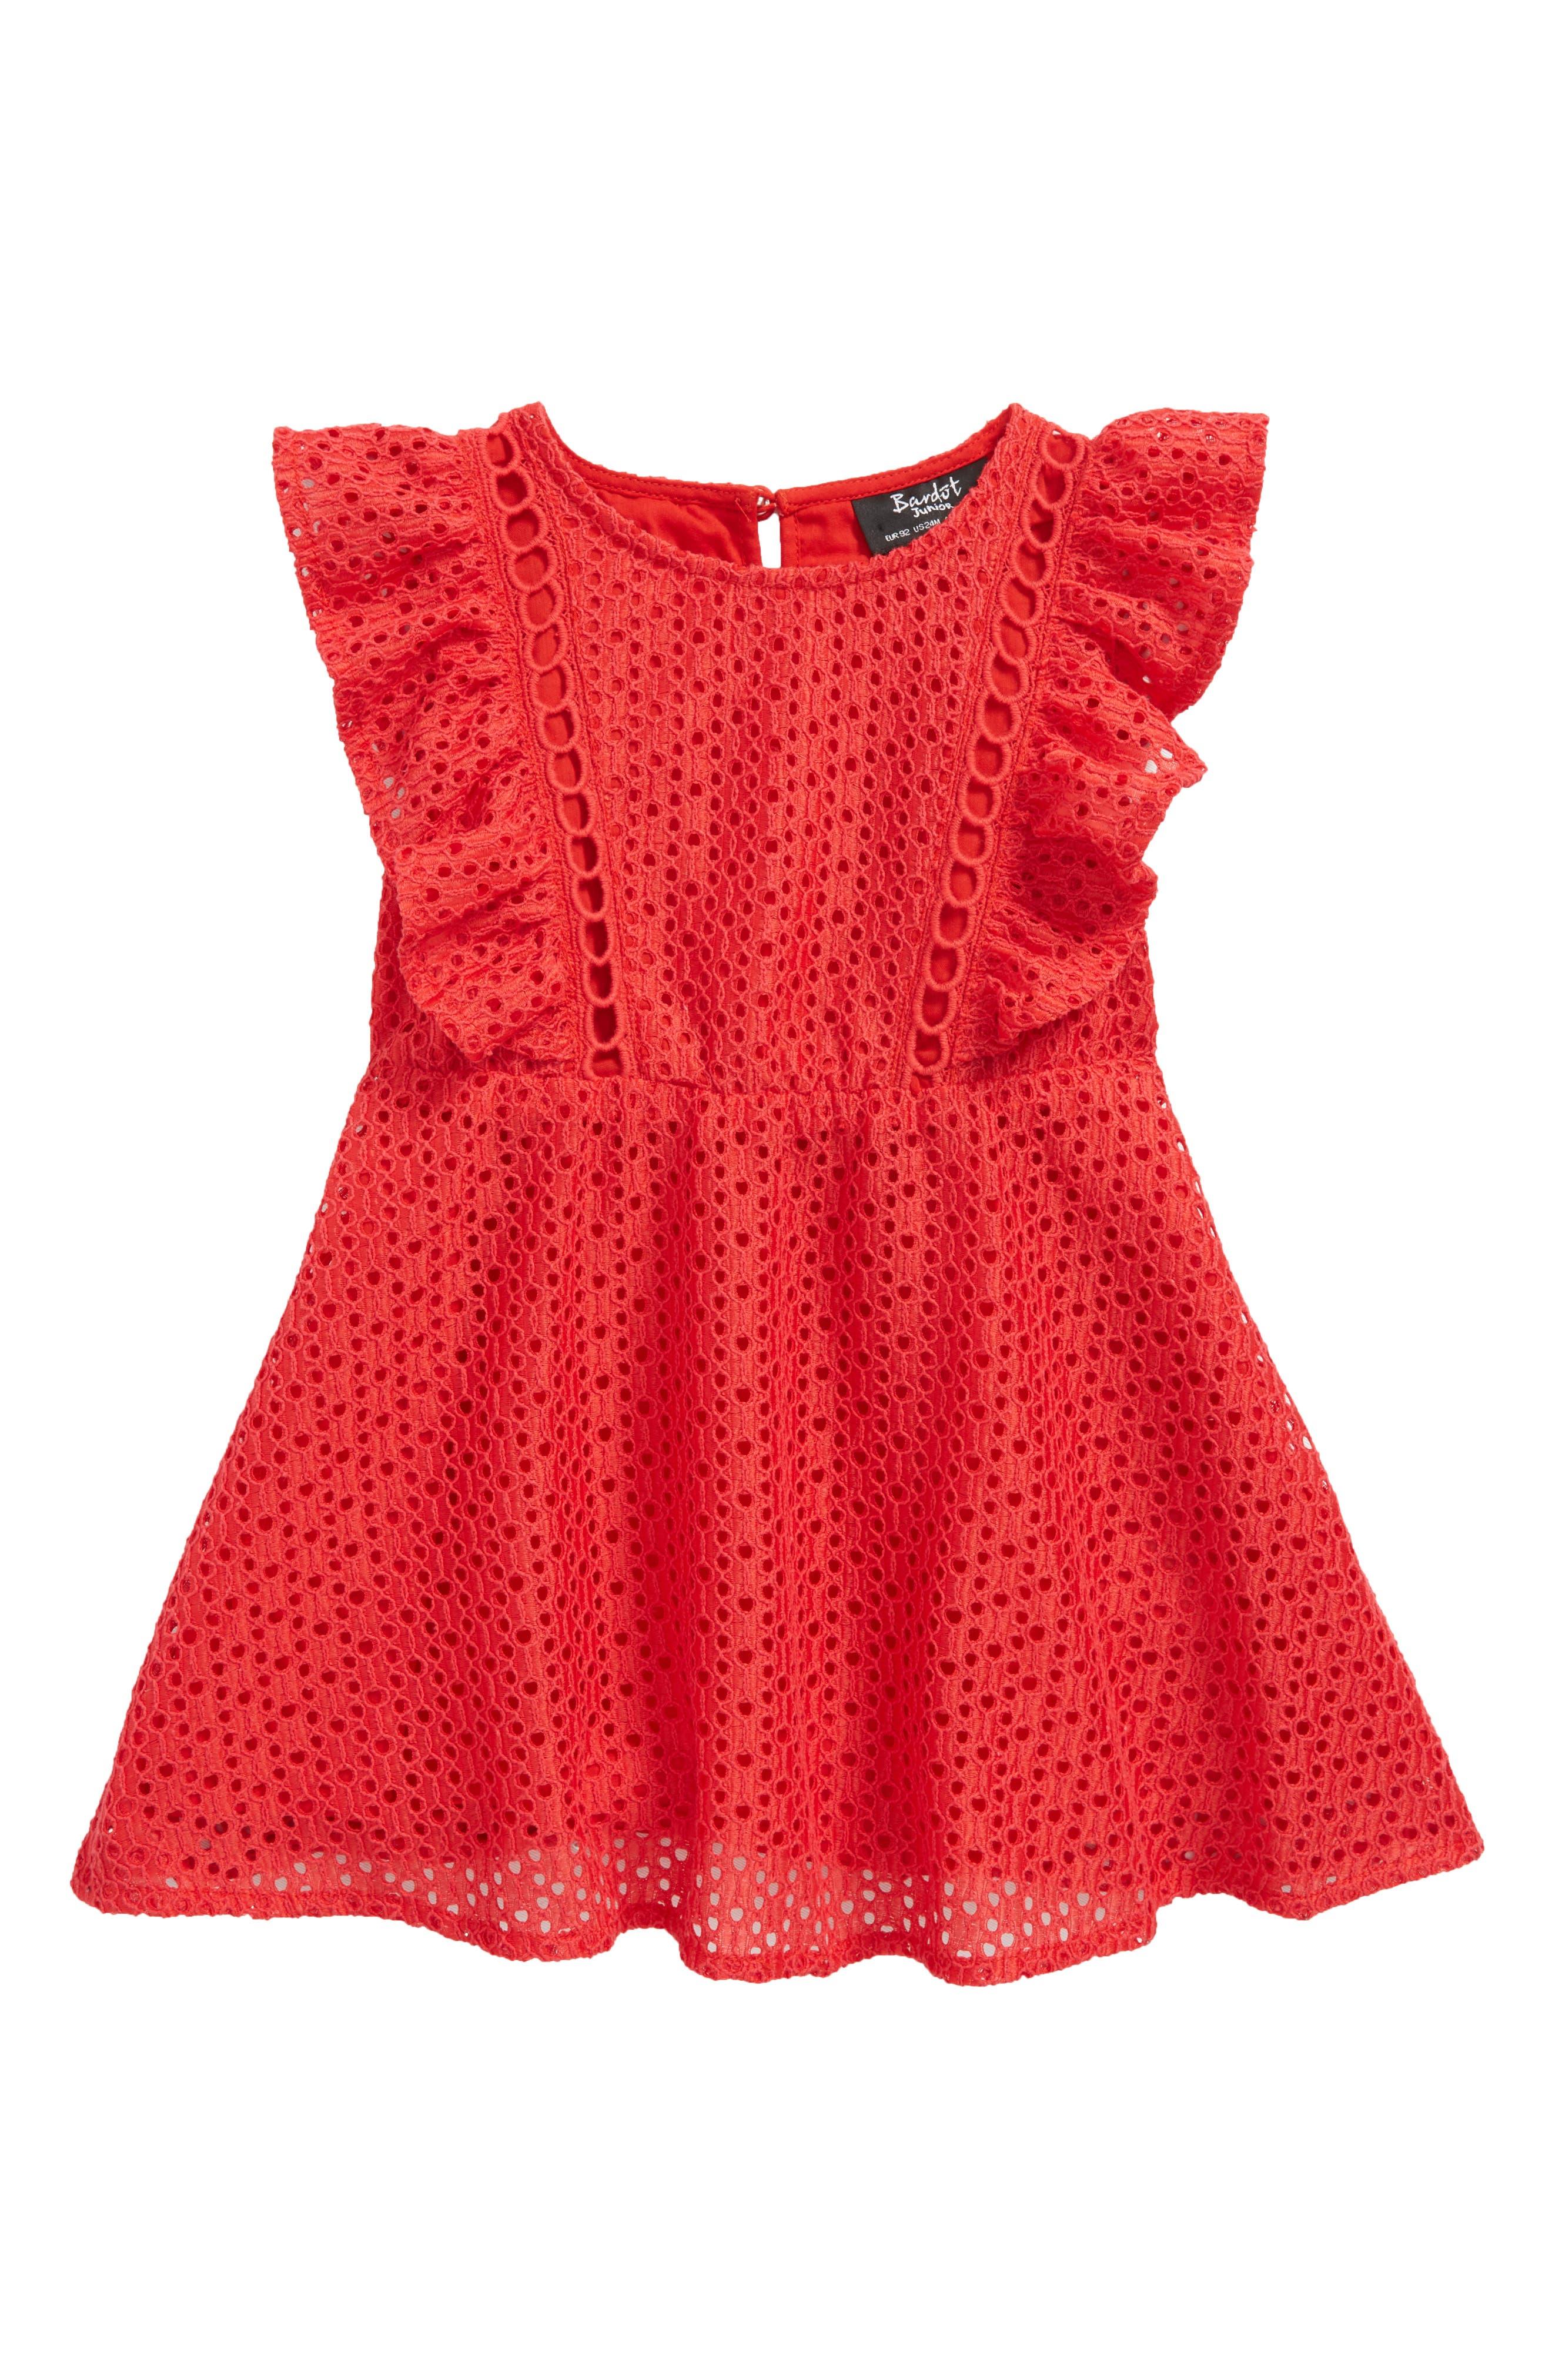 Bardot Tilly Eyelet Dress (Baby Girls)